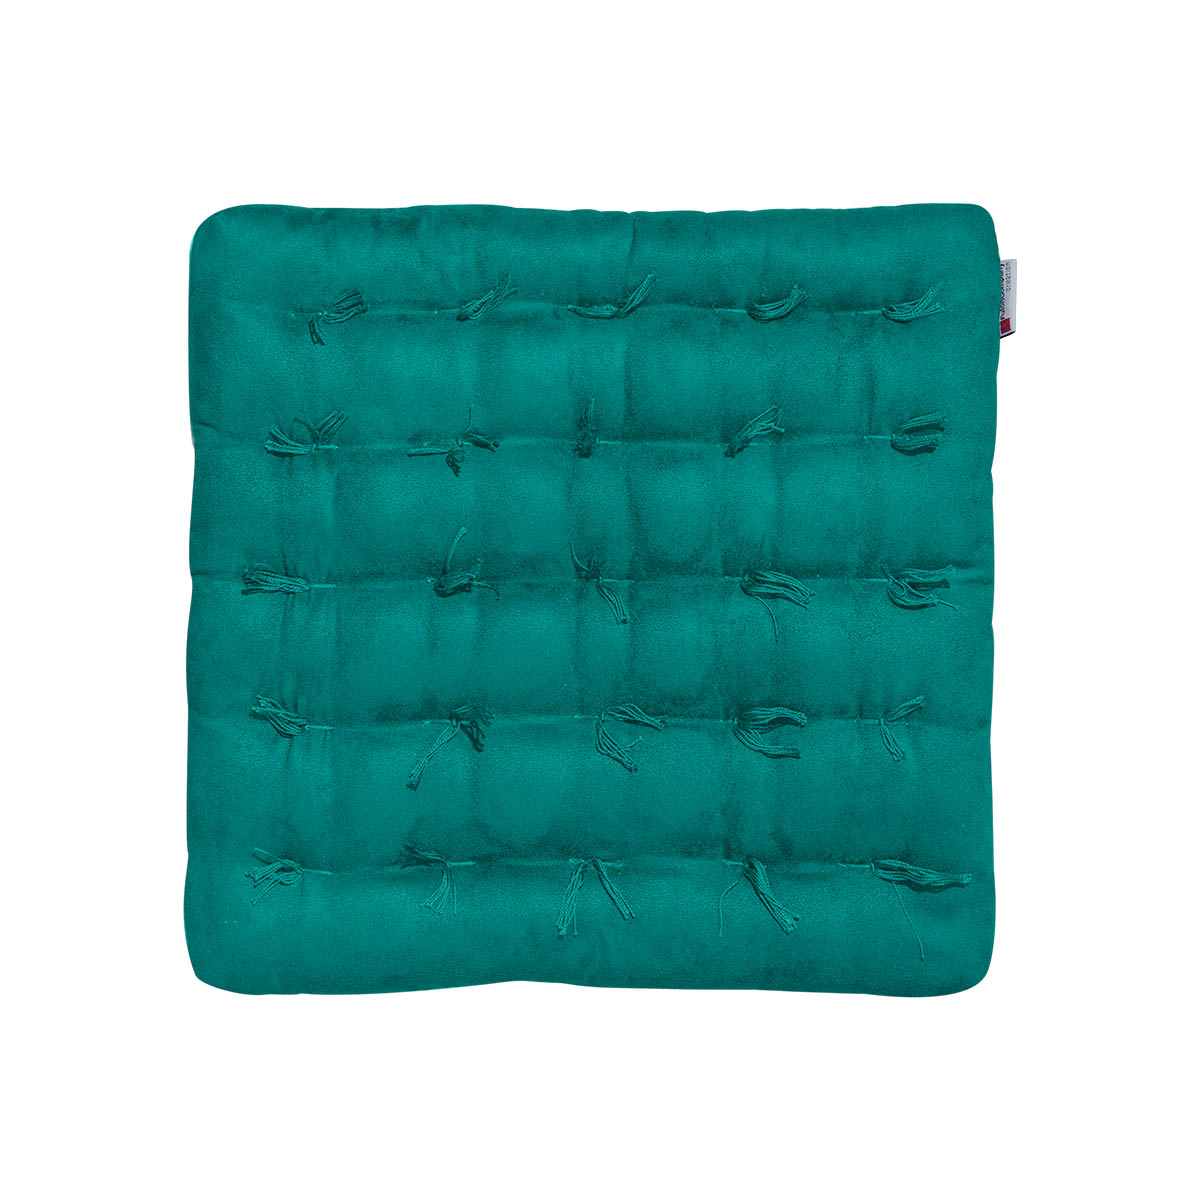 almofadas para cadeiras • Futon Company #02756F 1200x1200